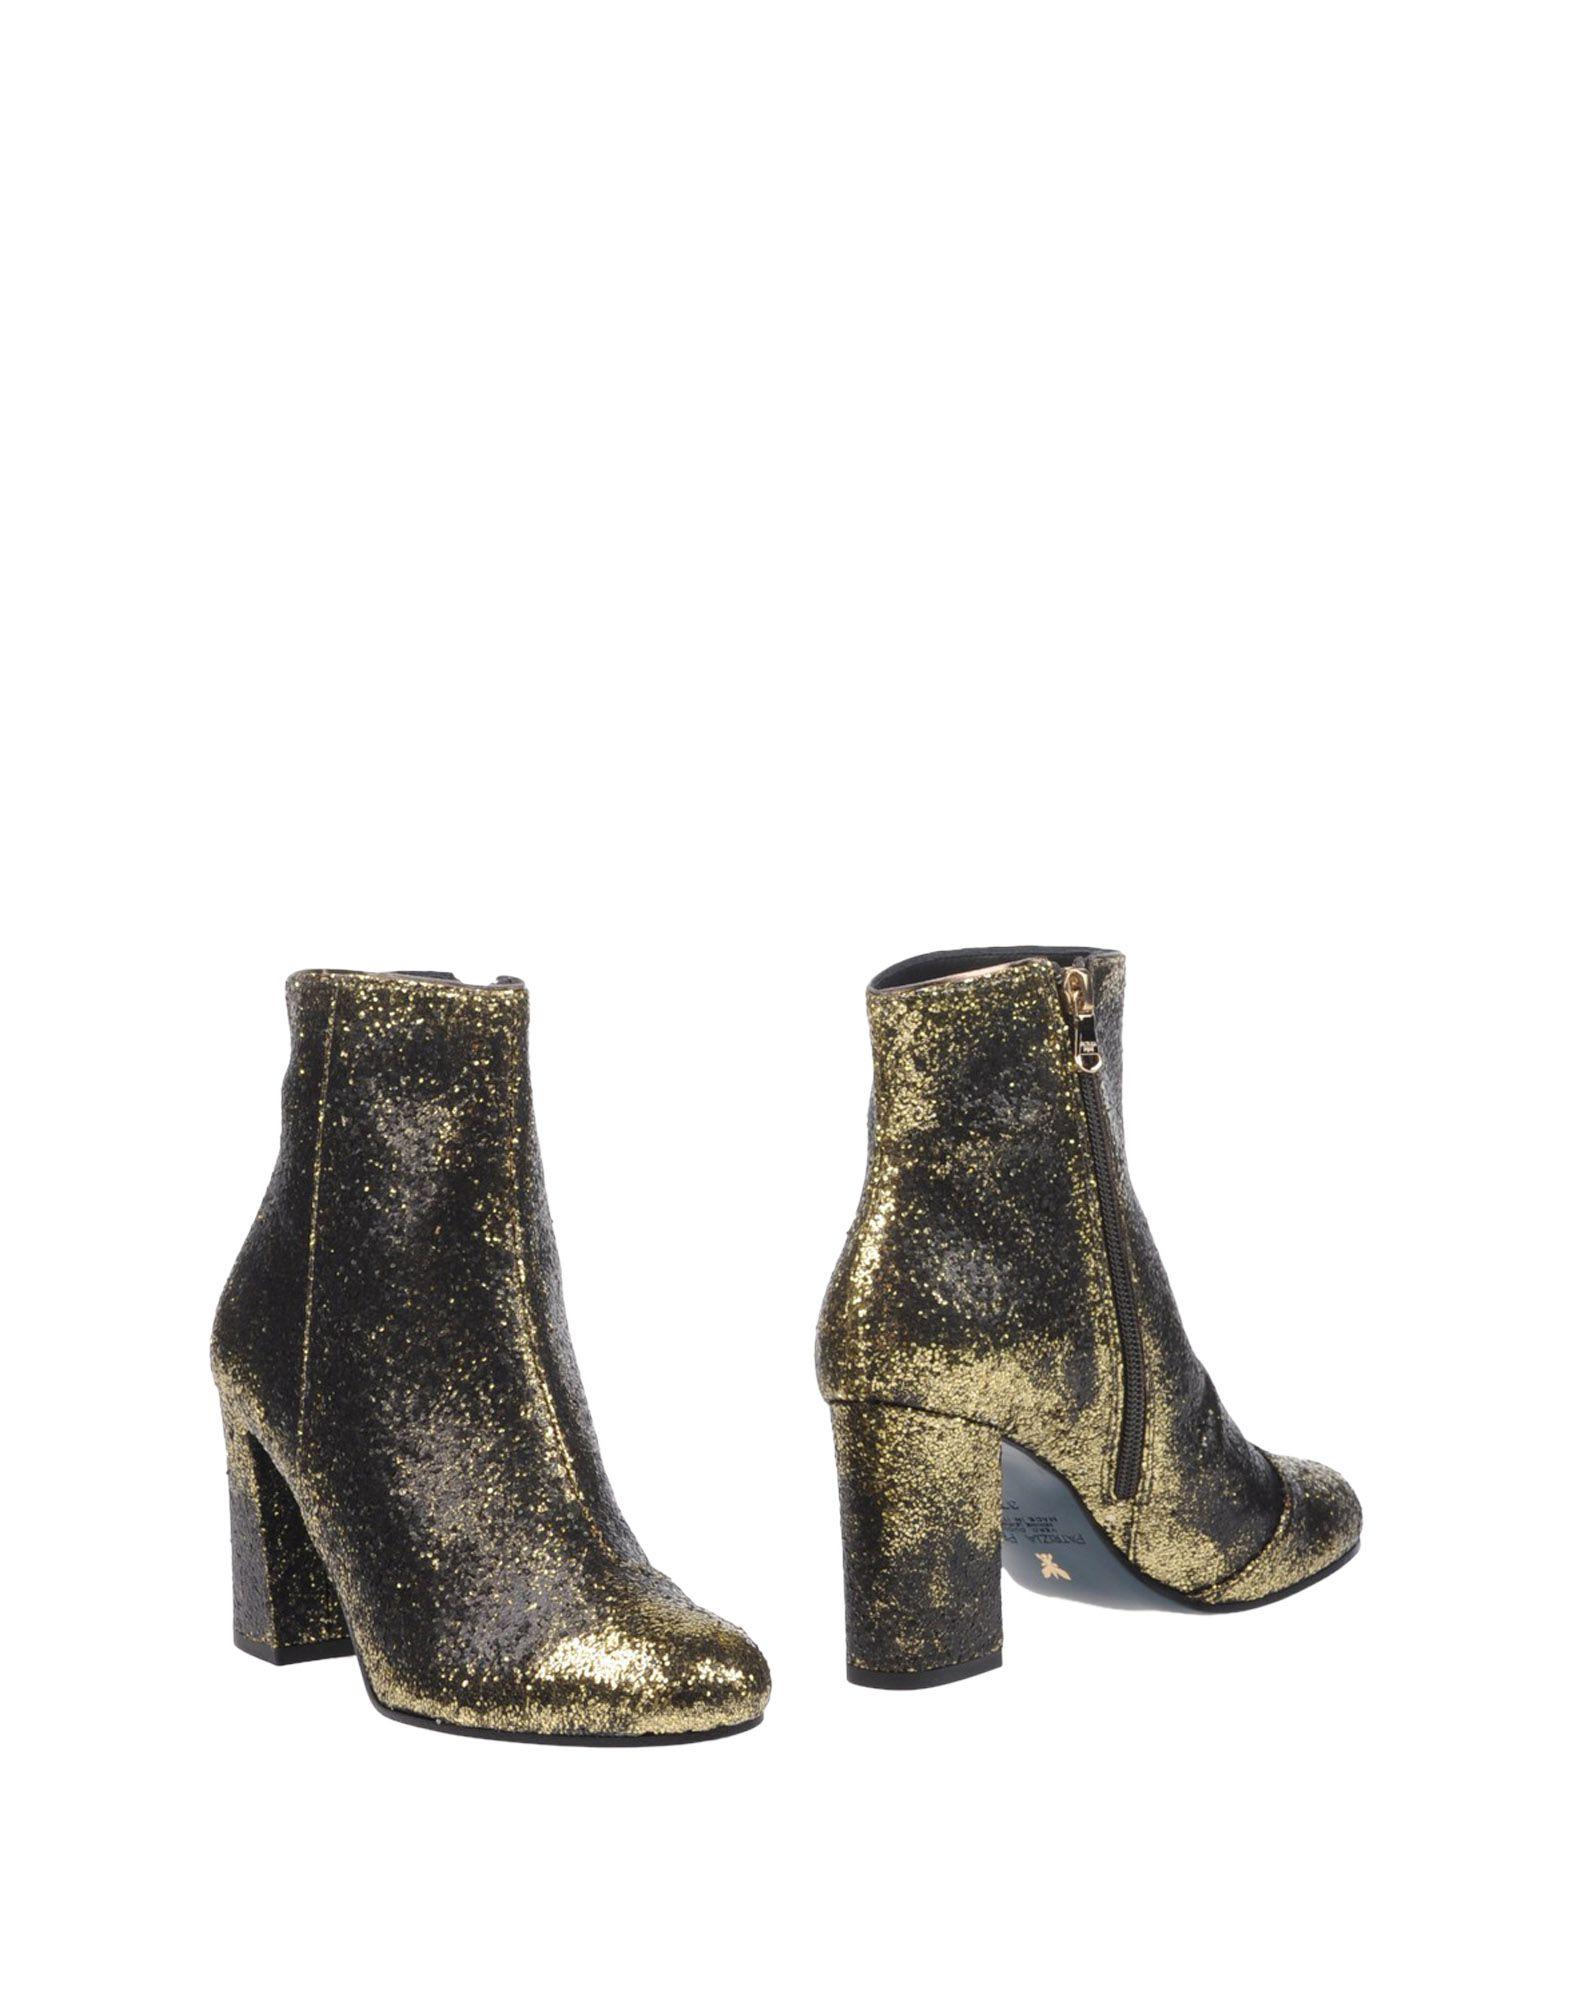 Patrizia Pepe Stiefelette Damen  11240070FWGut aussehende strapazierfähige Schuhe